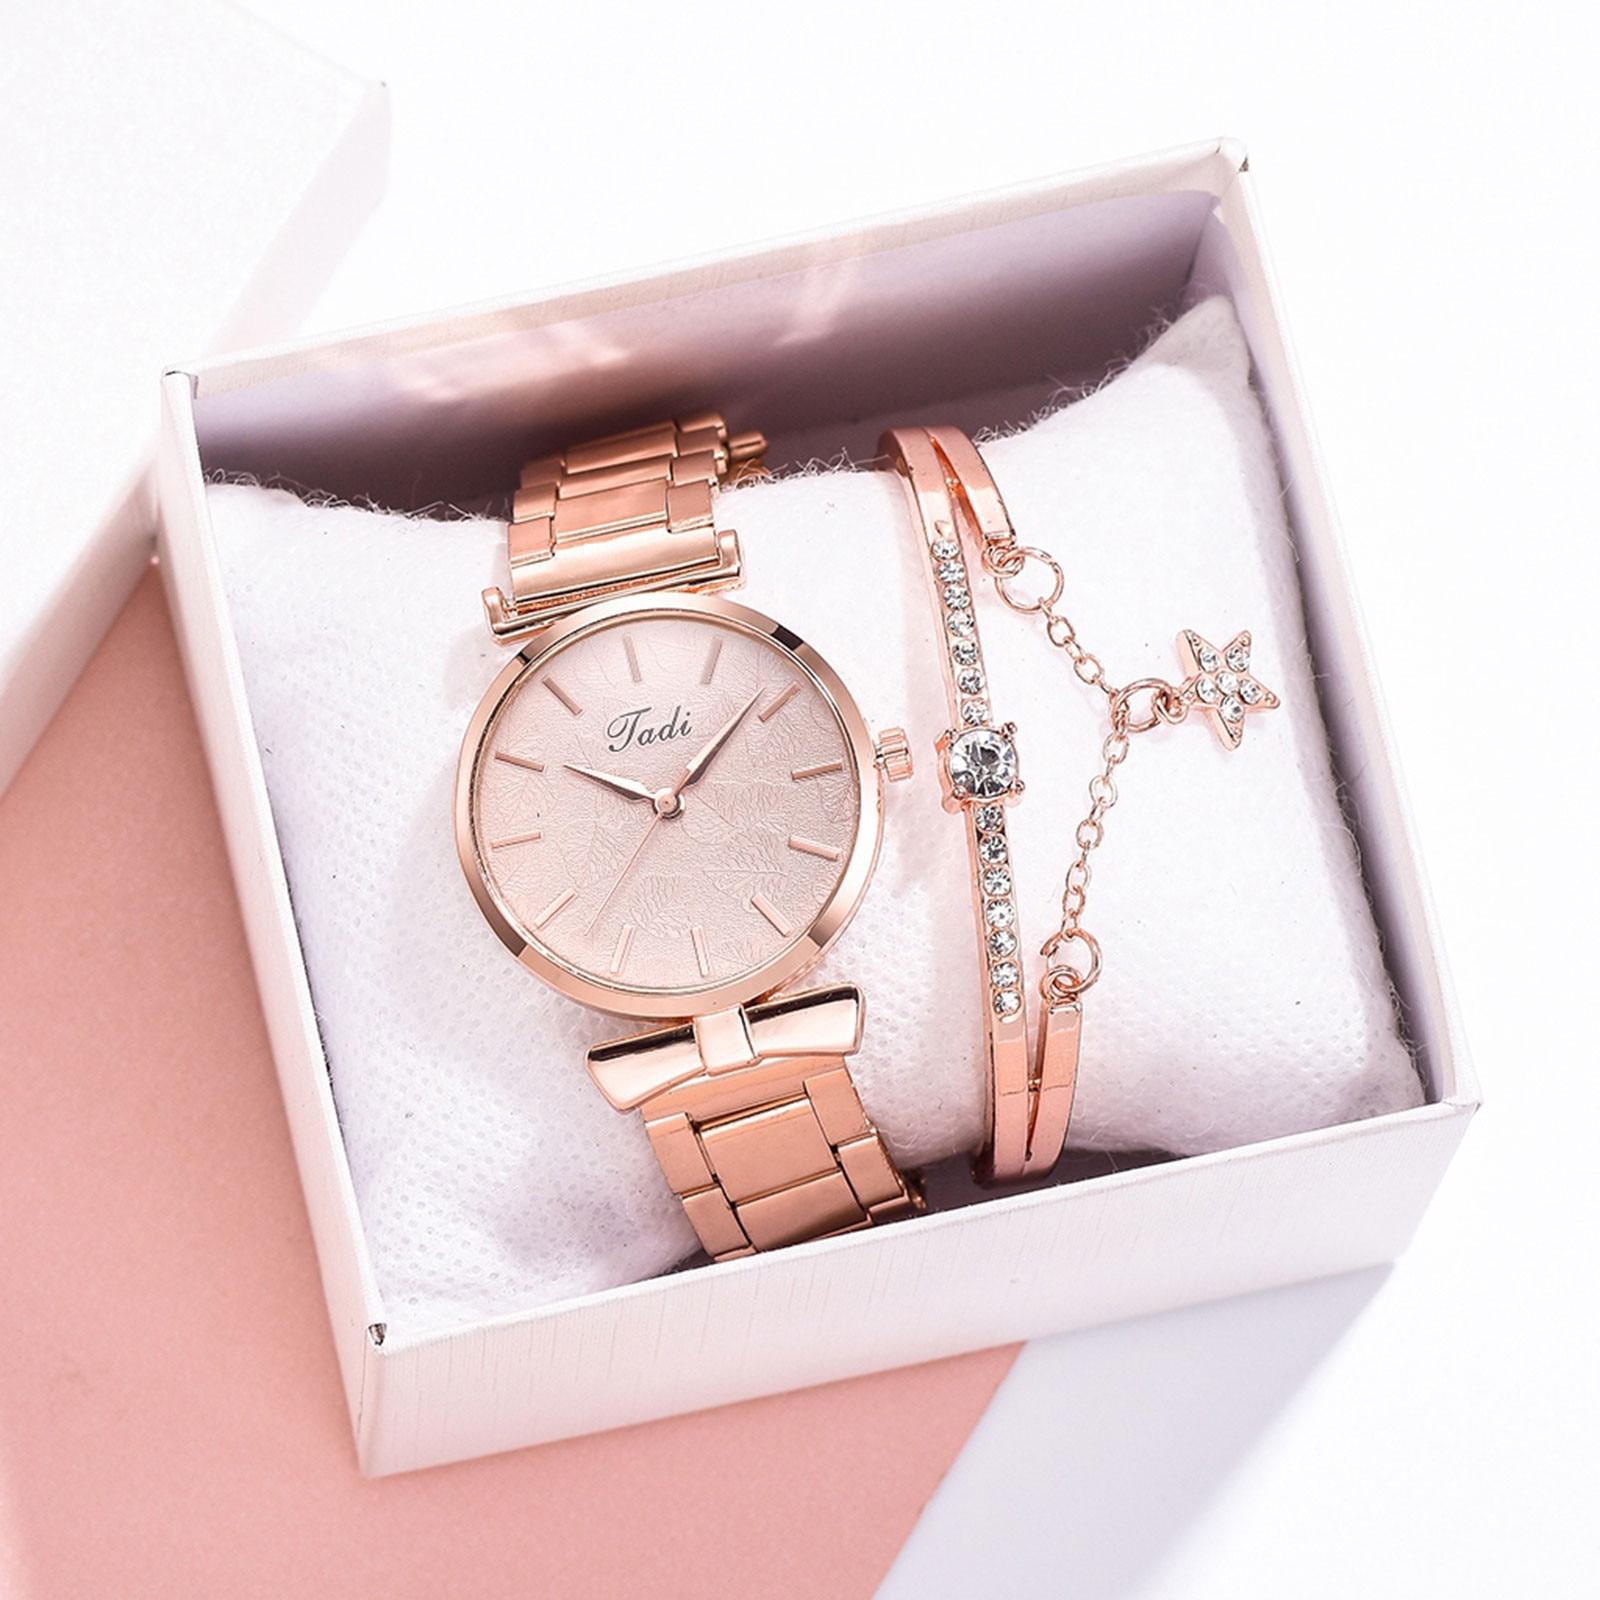 Quartz Wristwatches Women Quartz Analog Wrist Small Watch Luxury Casual Bracelet Watches Montre Femme Relogio Feminino watch